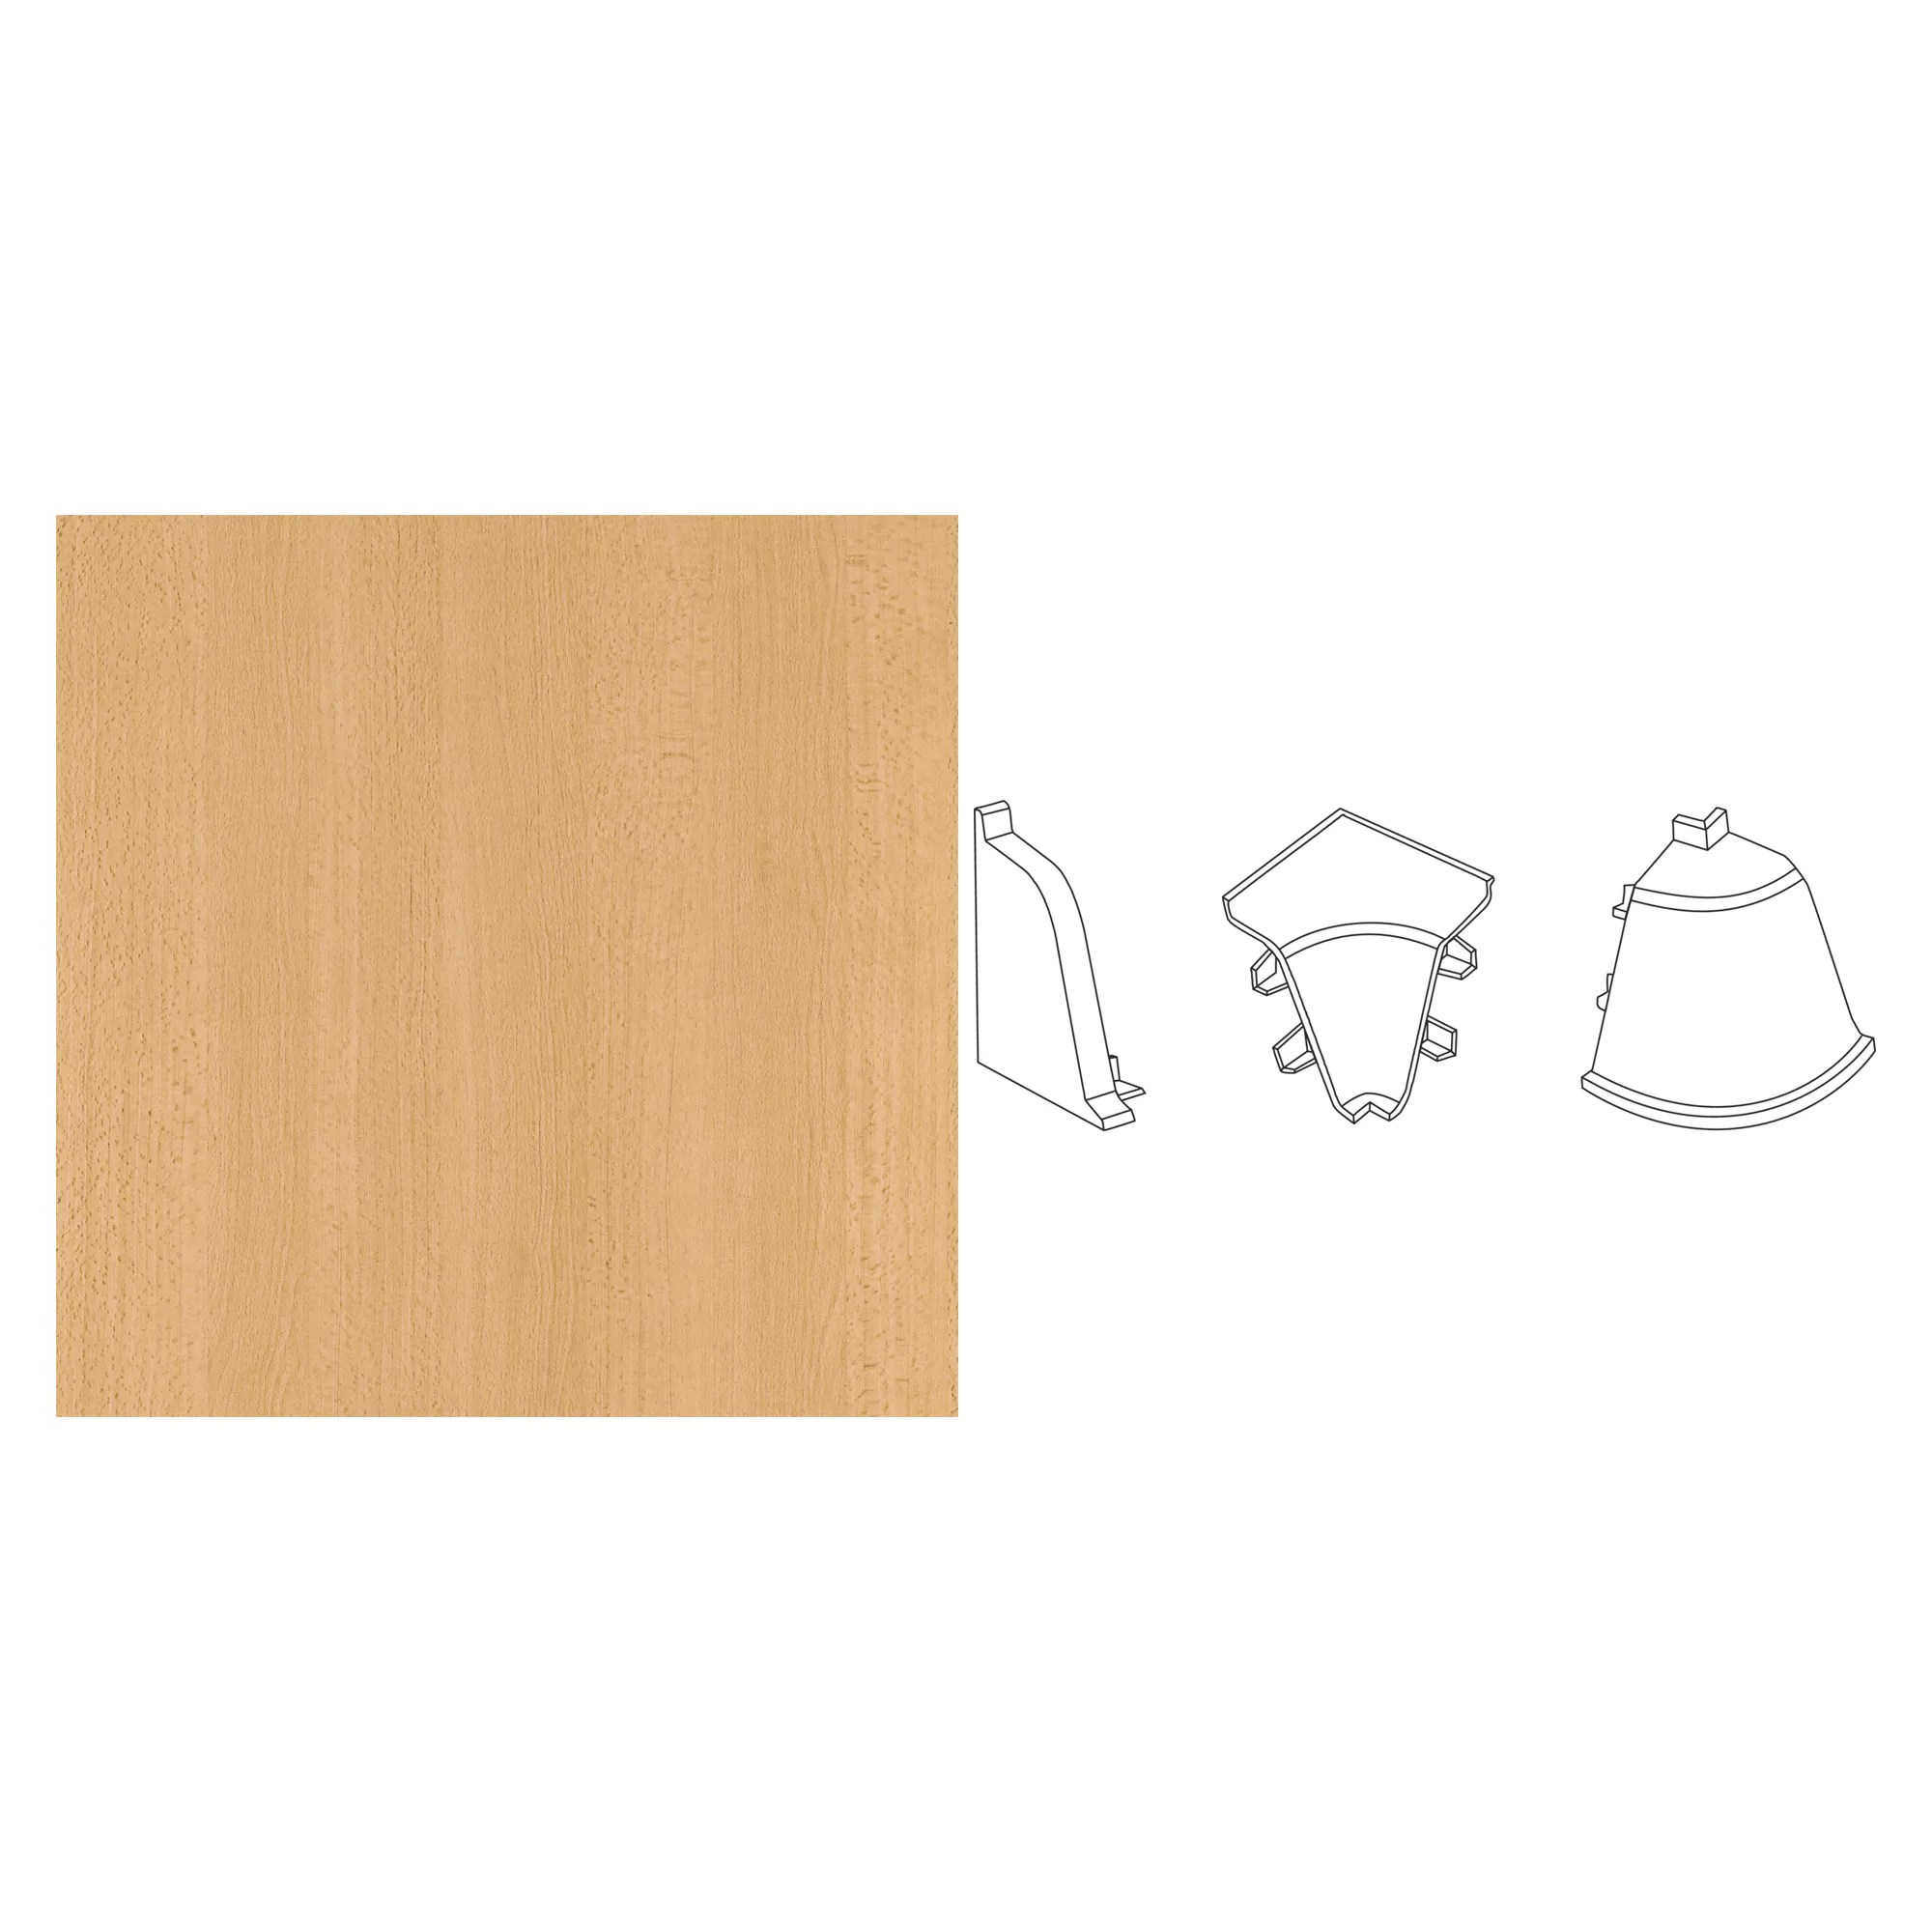 Getaelements Endkappe Compact Buche 35 X 25 Mm ǀ Toom Baumarkt